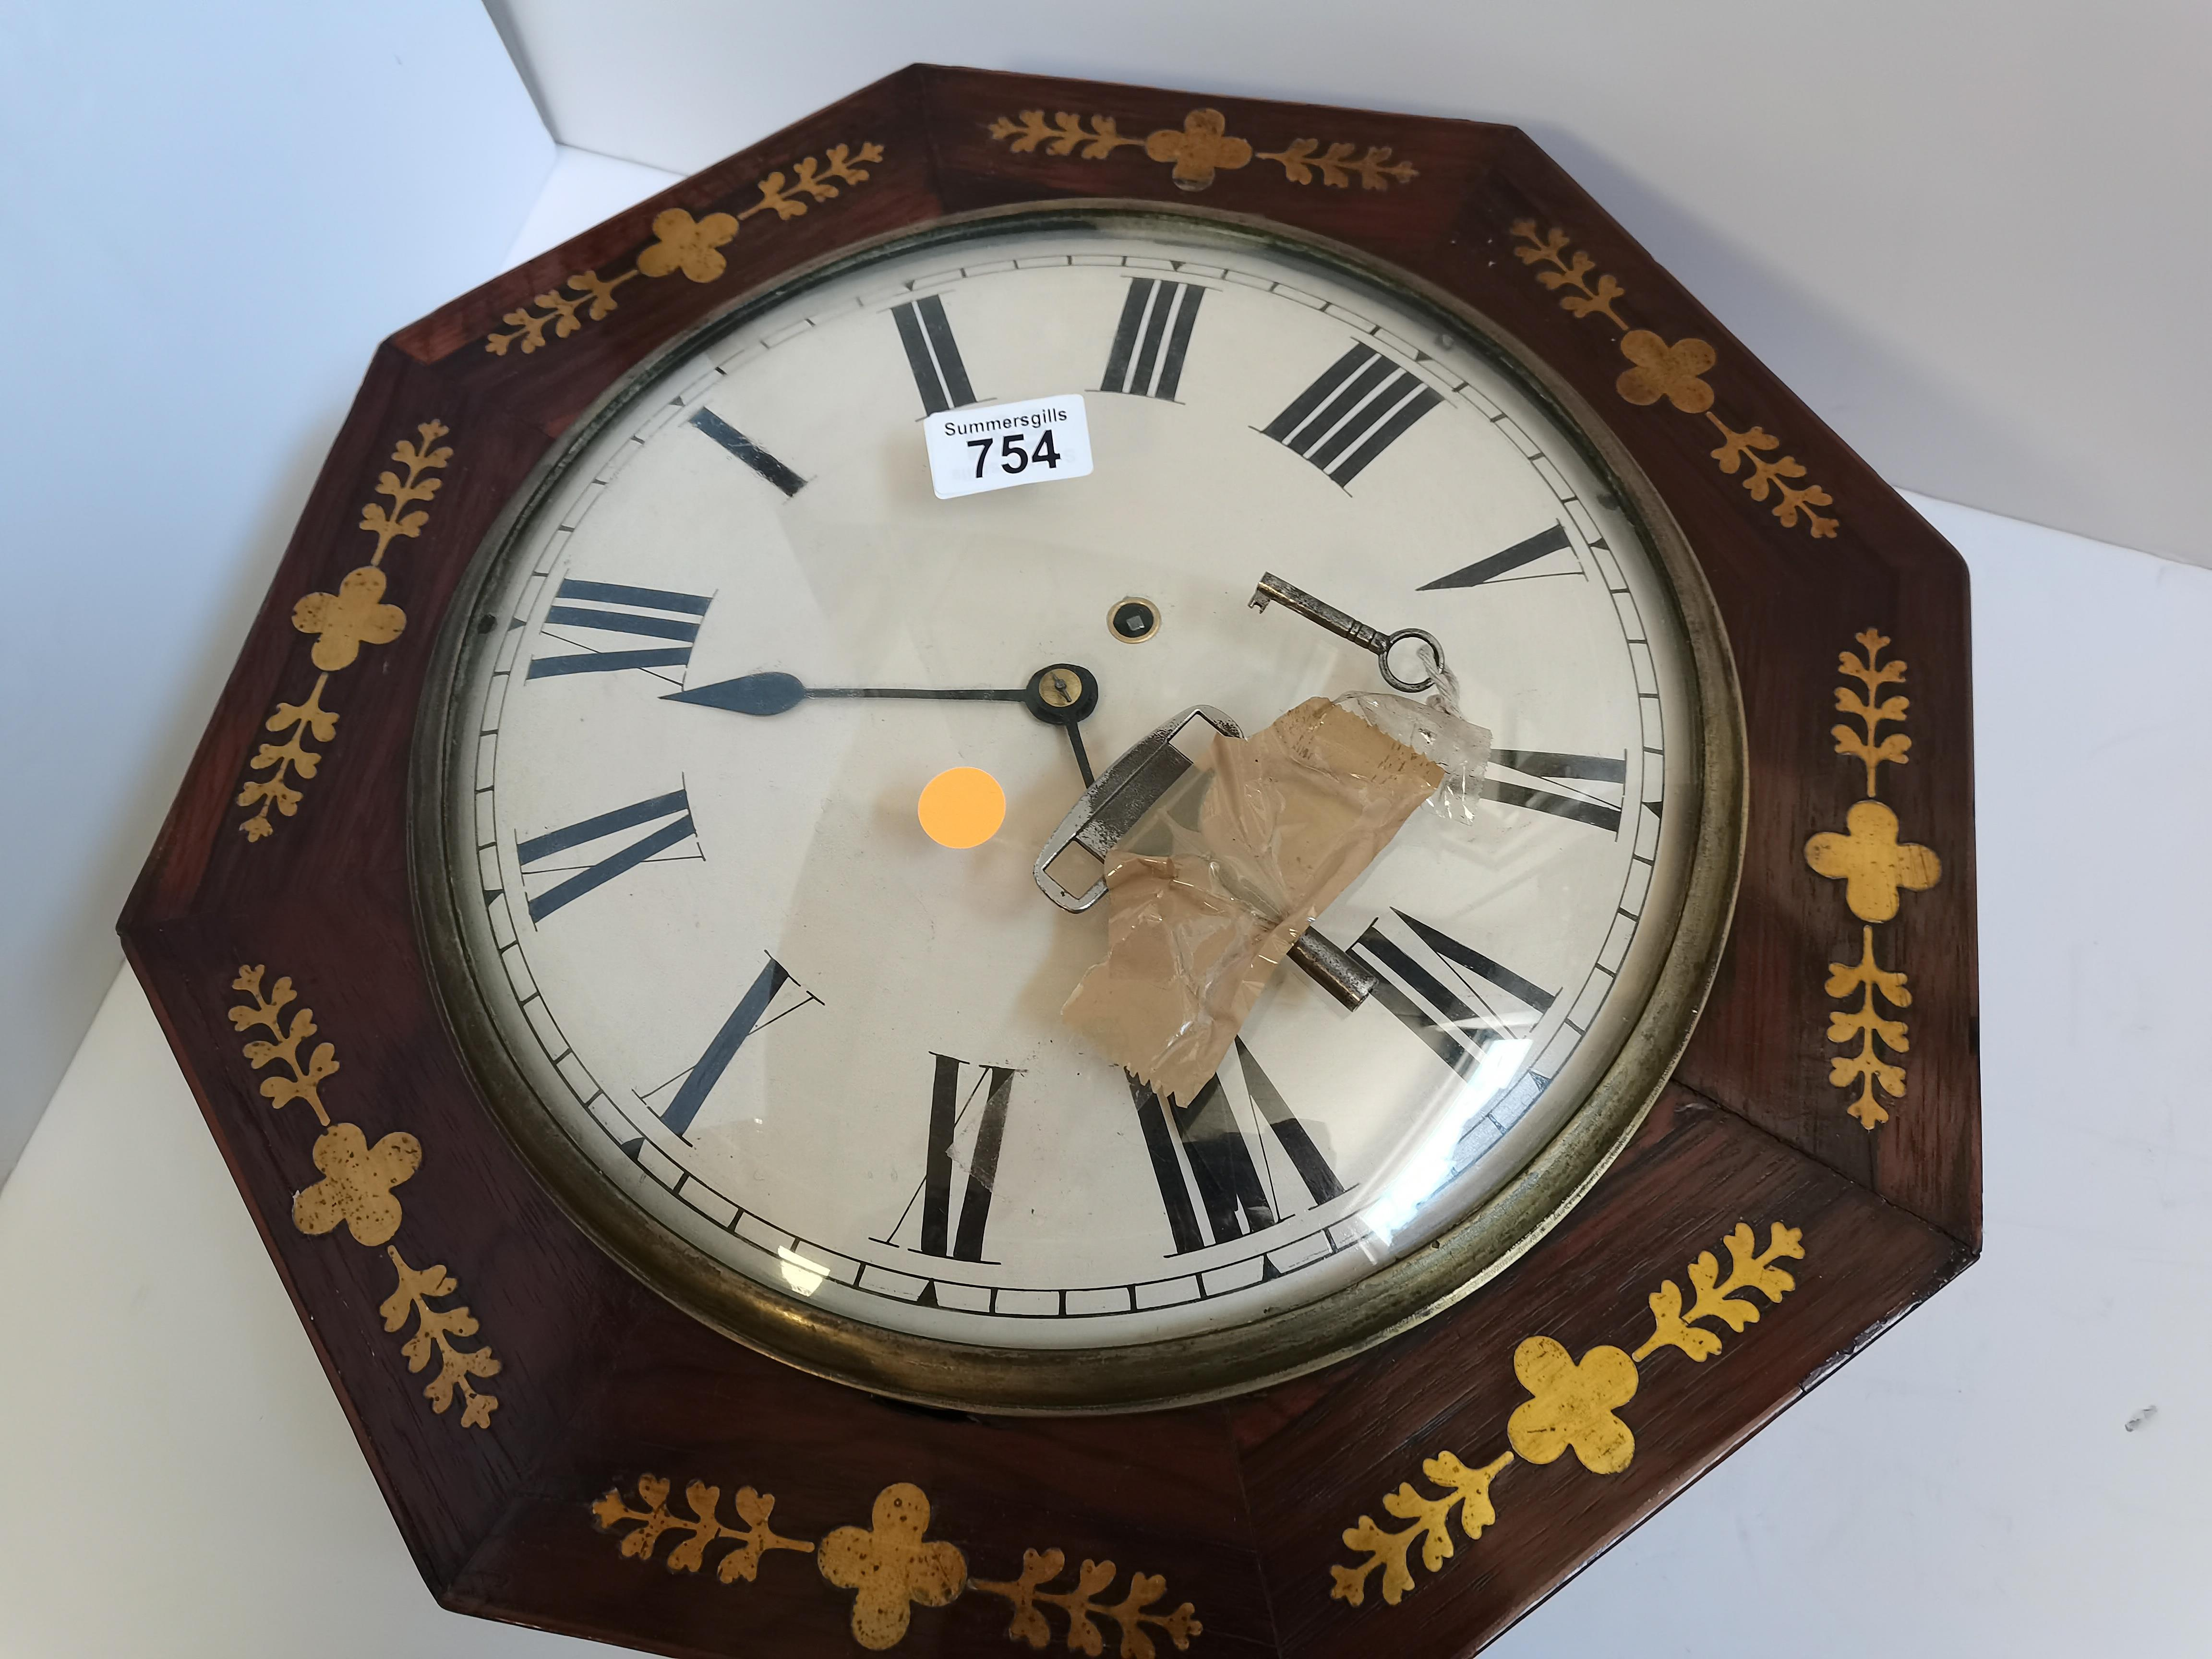 Regency Wall Clock - Image 5 of 6